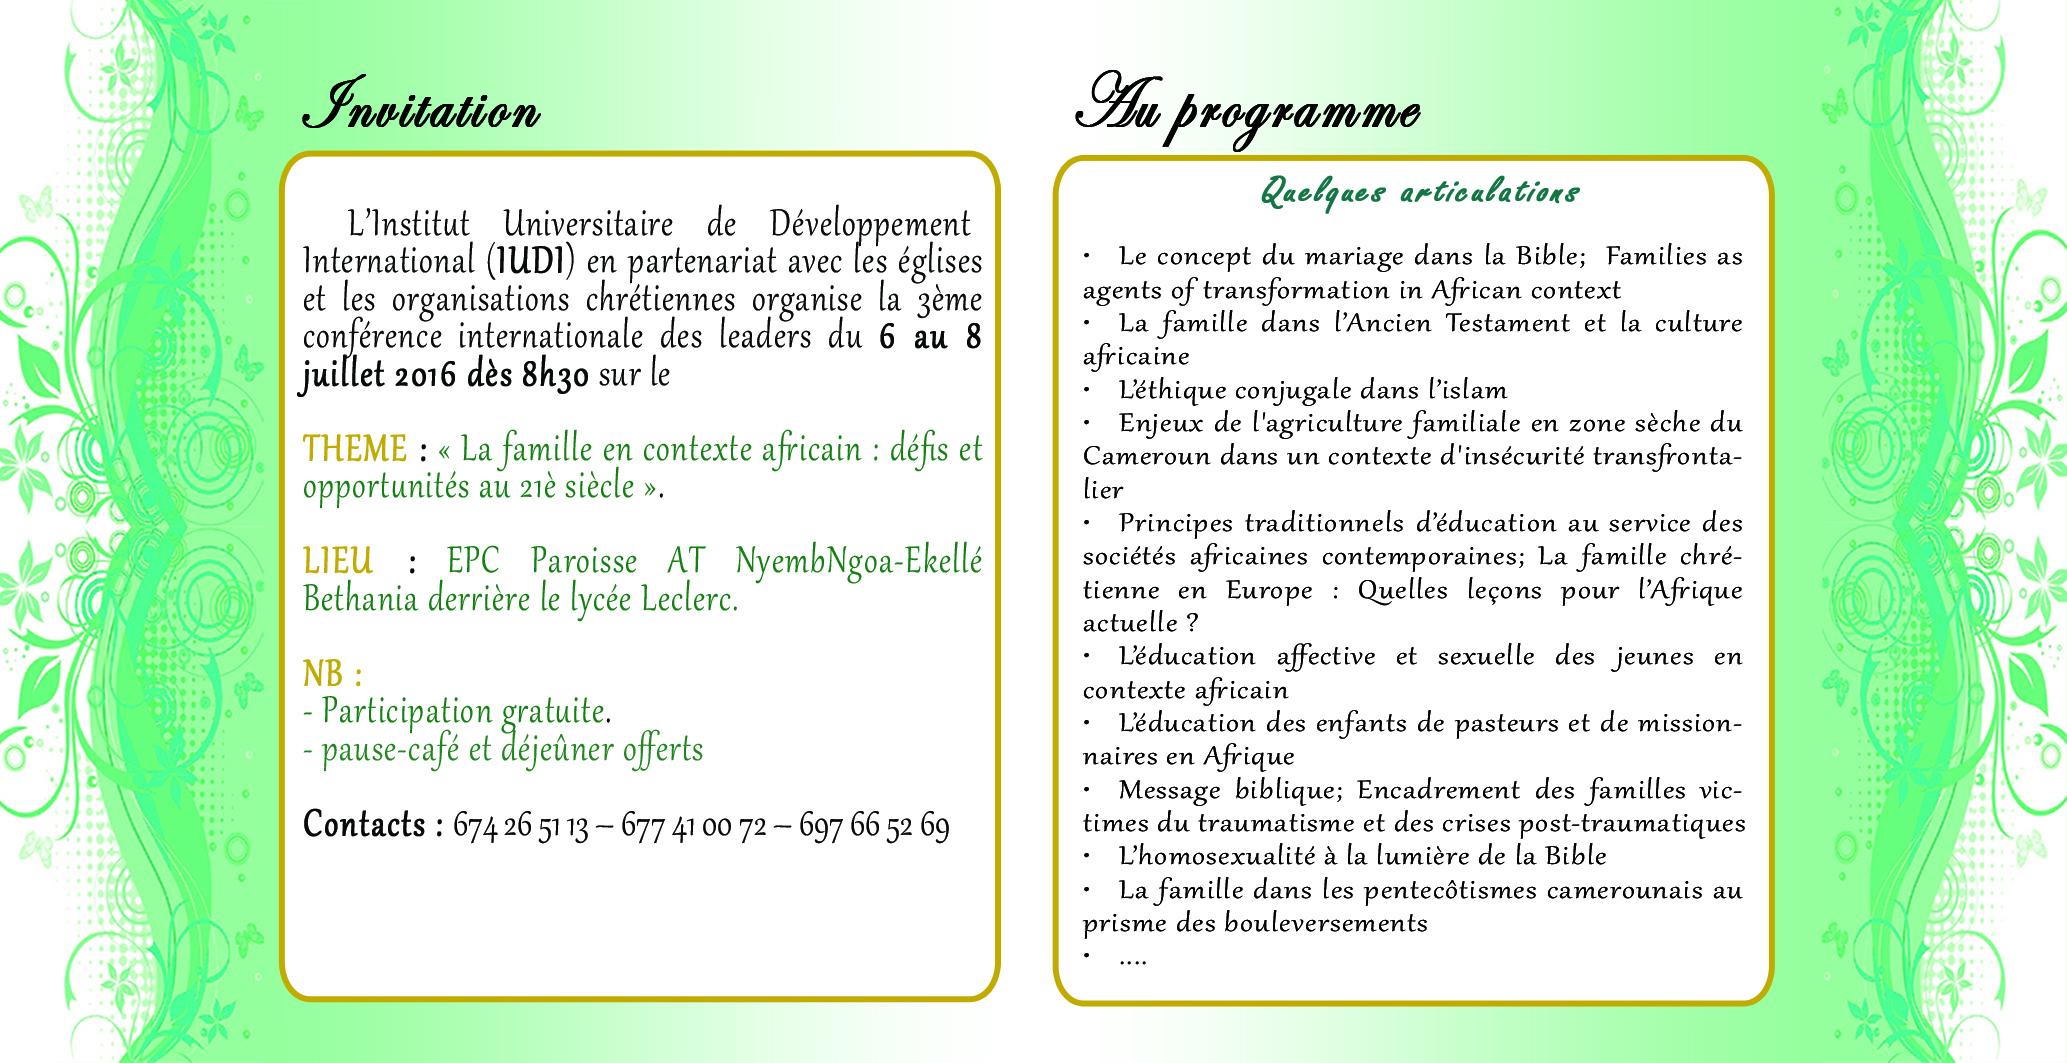 Programme de la conference.jpg